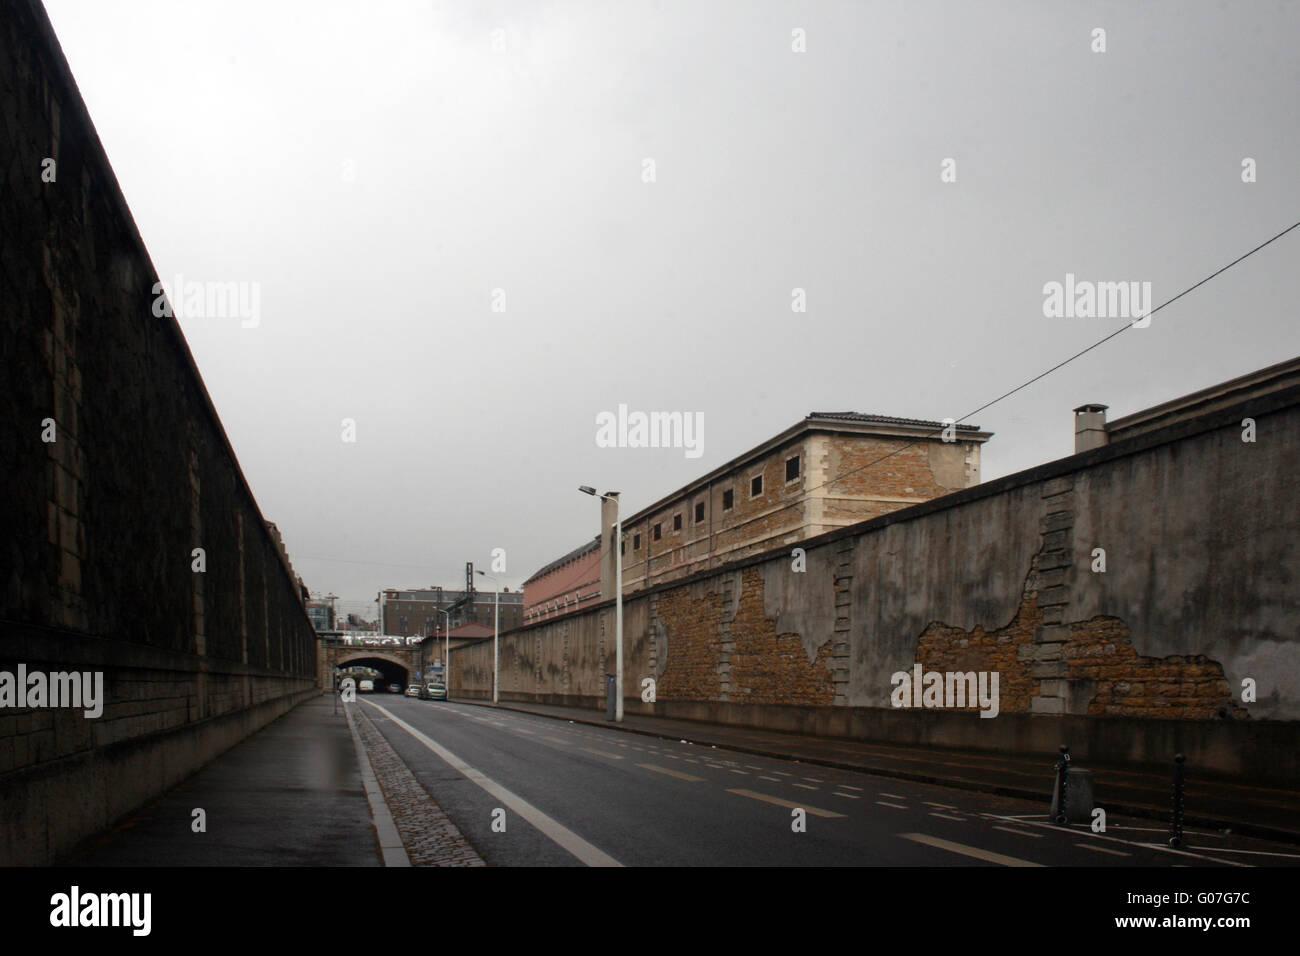 old street - Stock Image